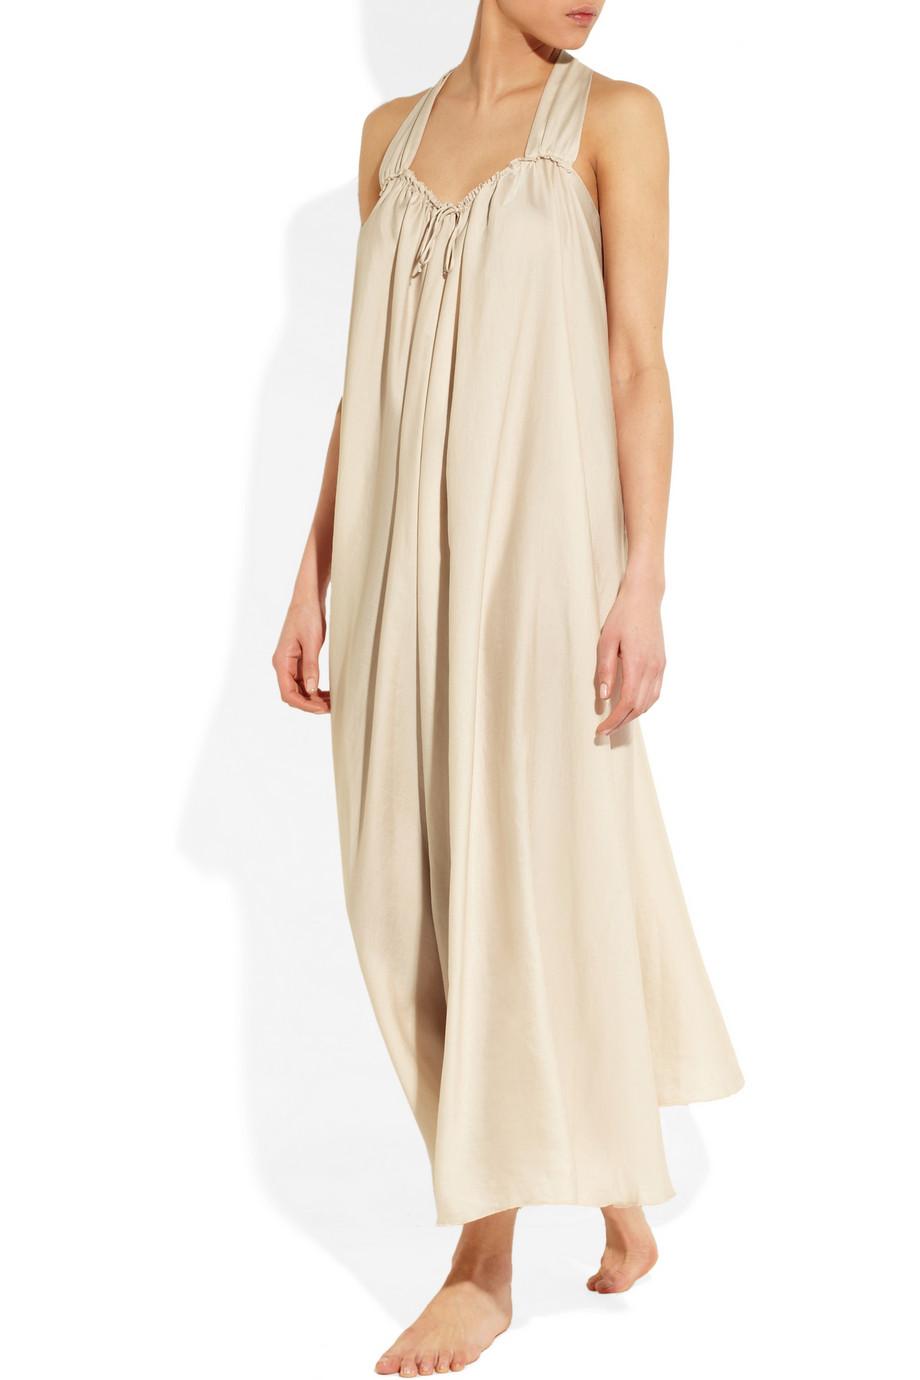 Donna Karan Washed Georgette Nightdress in Pink - Lyst a62610daa